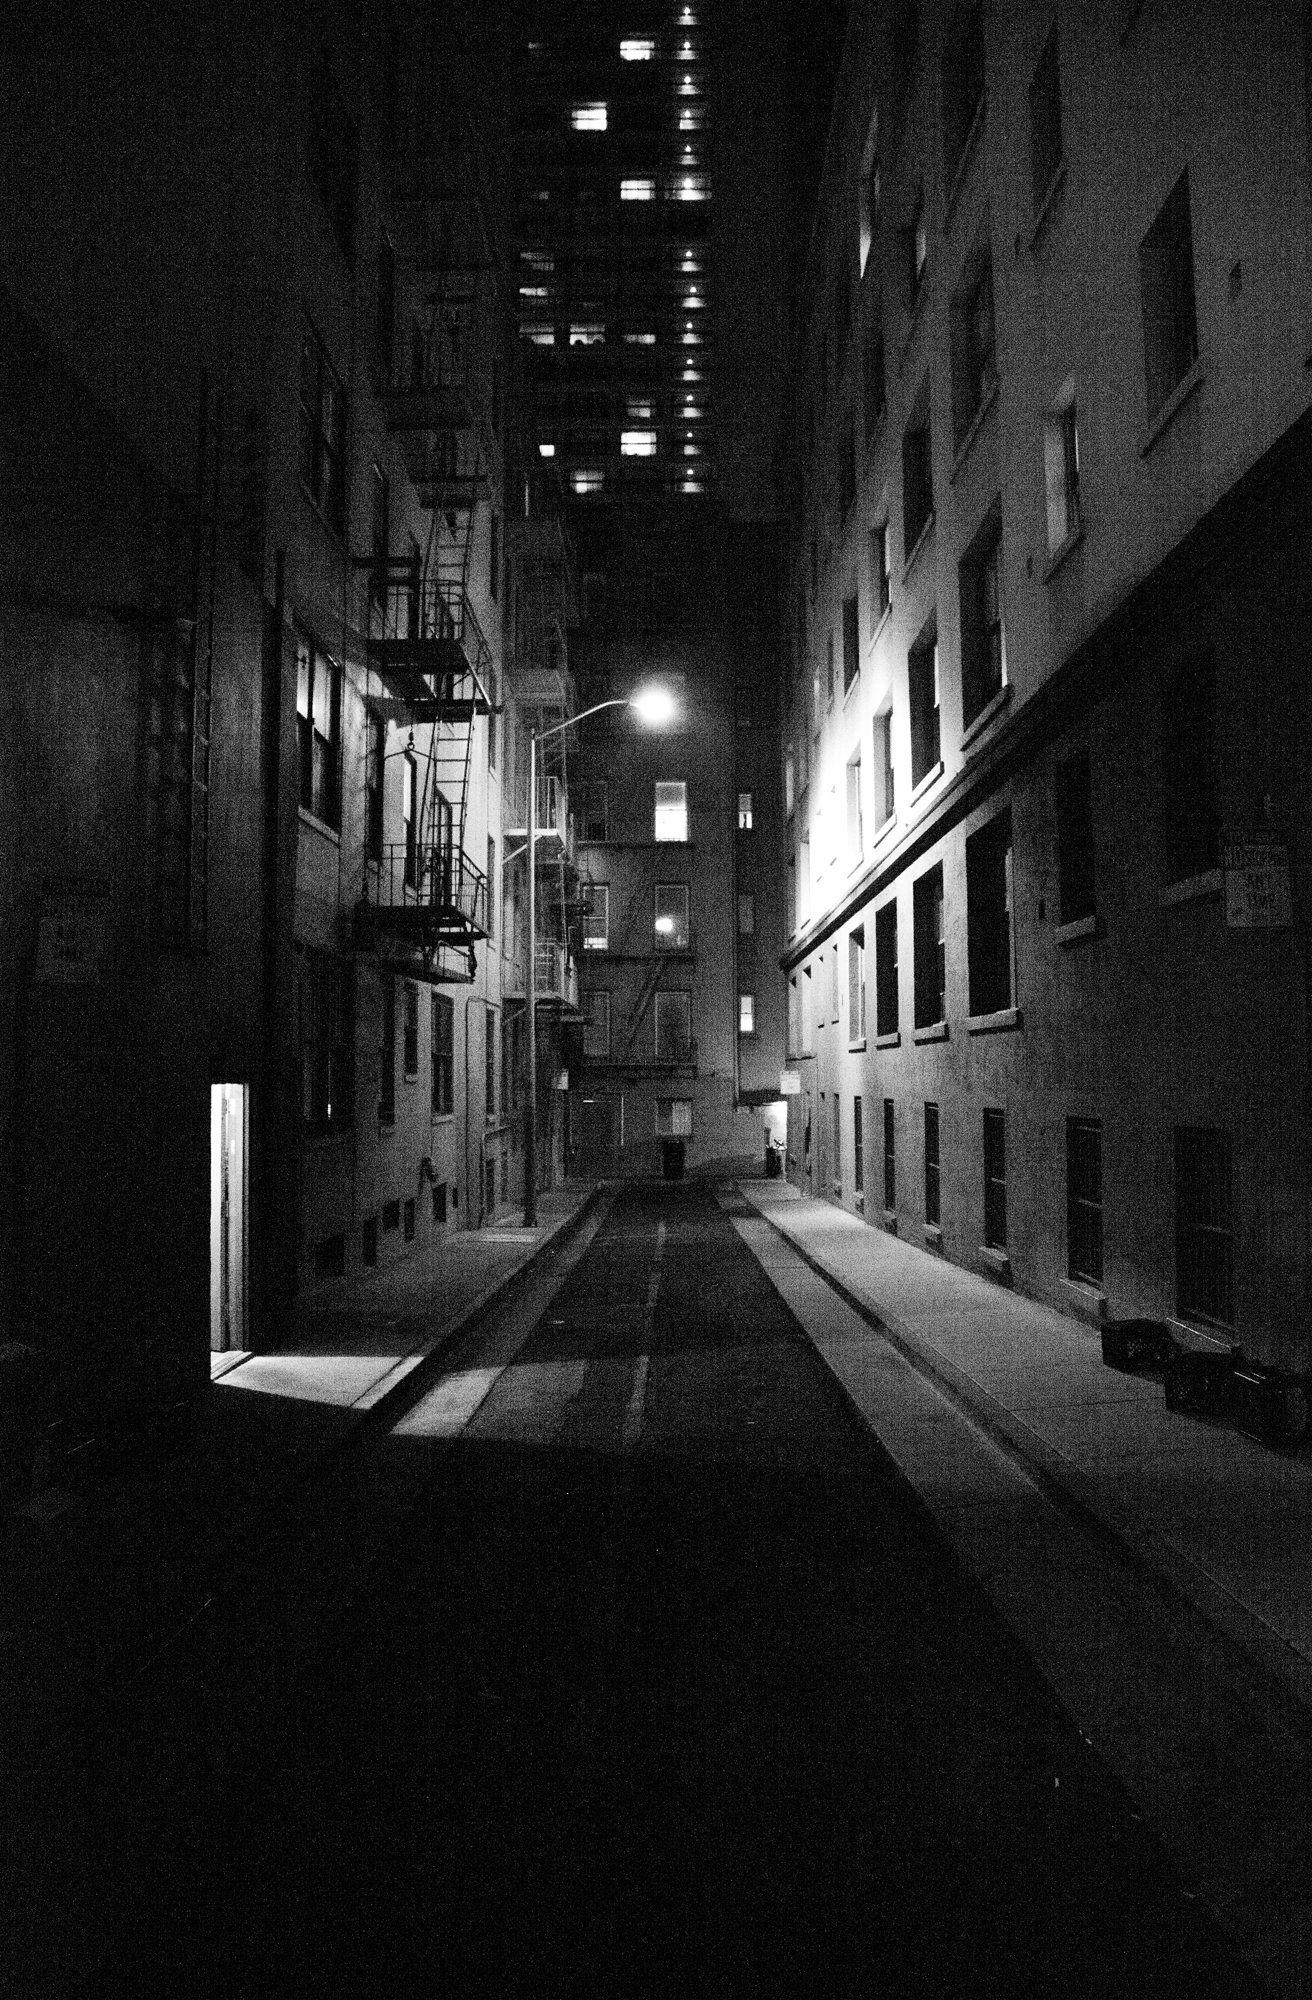 San Francisco Noir - The New York Times | LPN 2 | Film noir